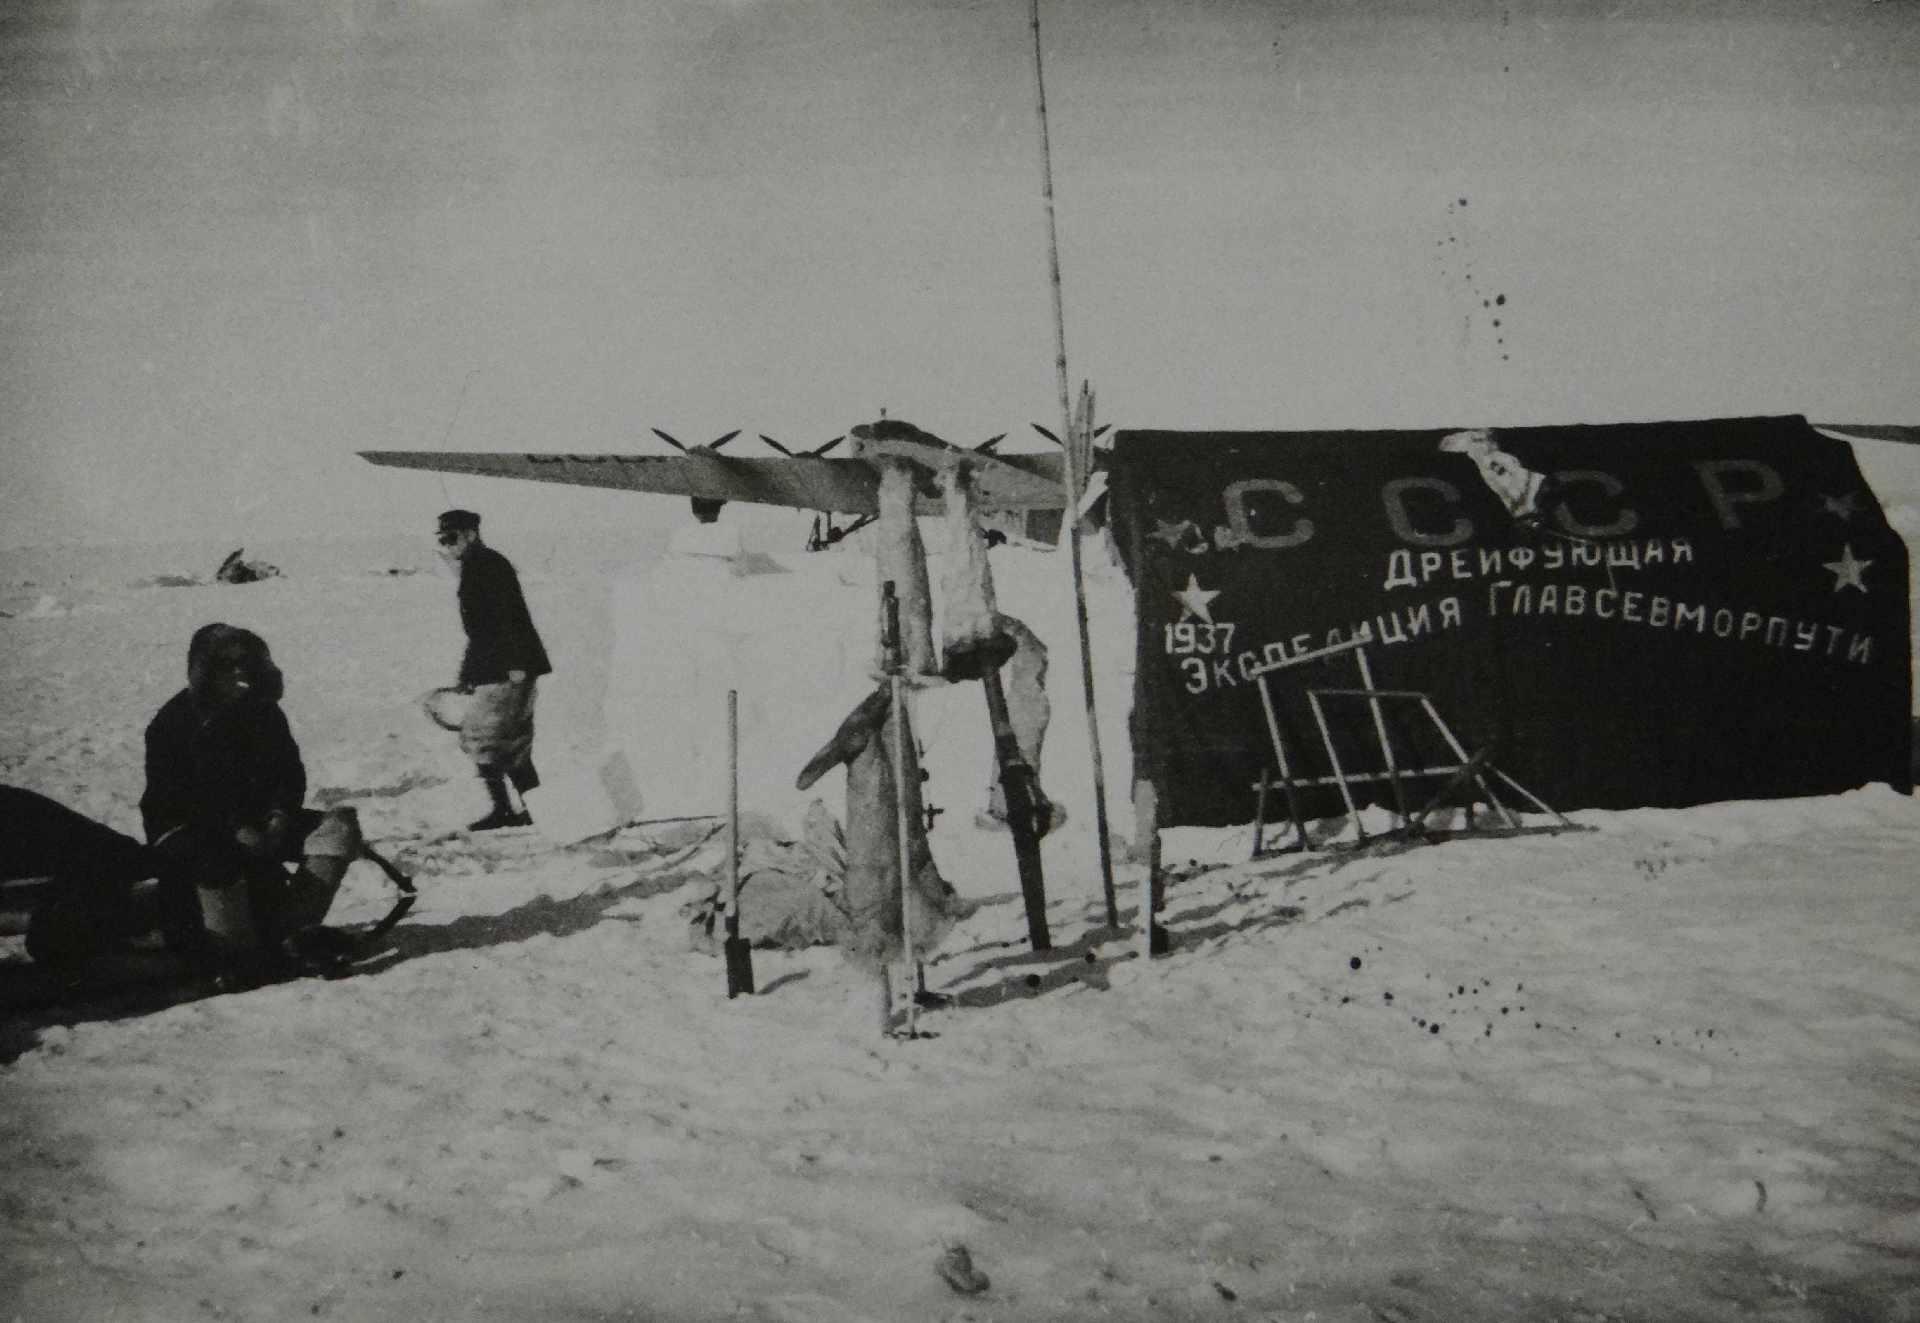 Экспонат #80. СП-1. «Папанинцы». 1937 год